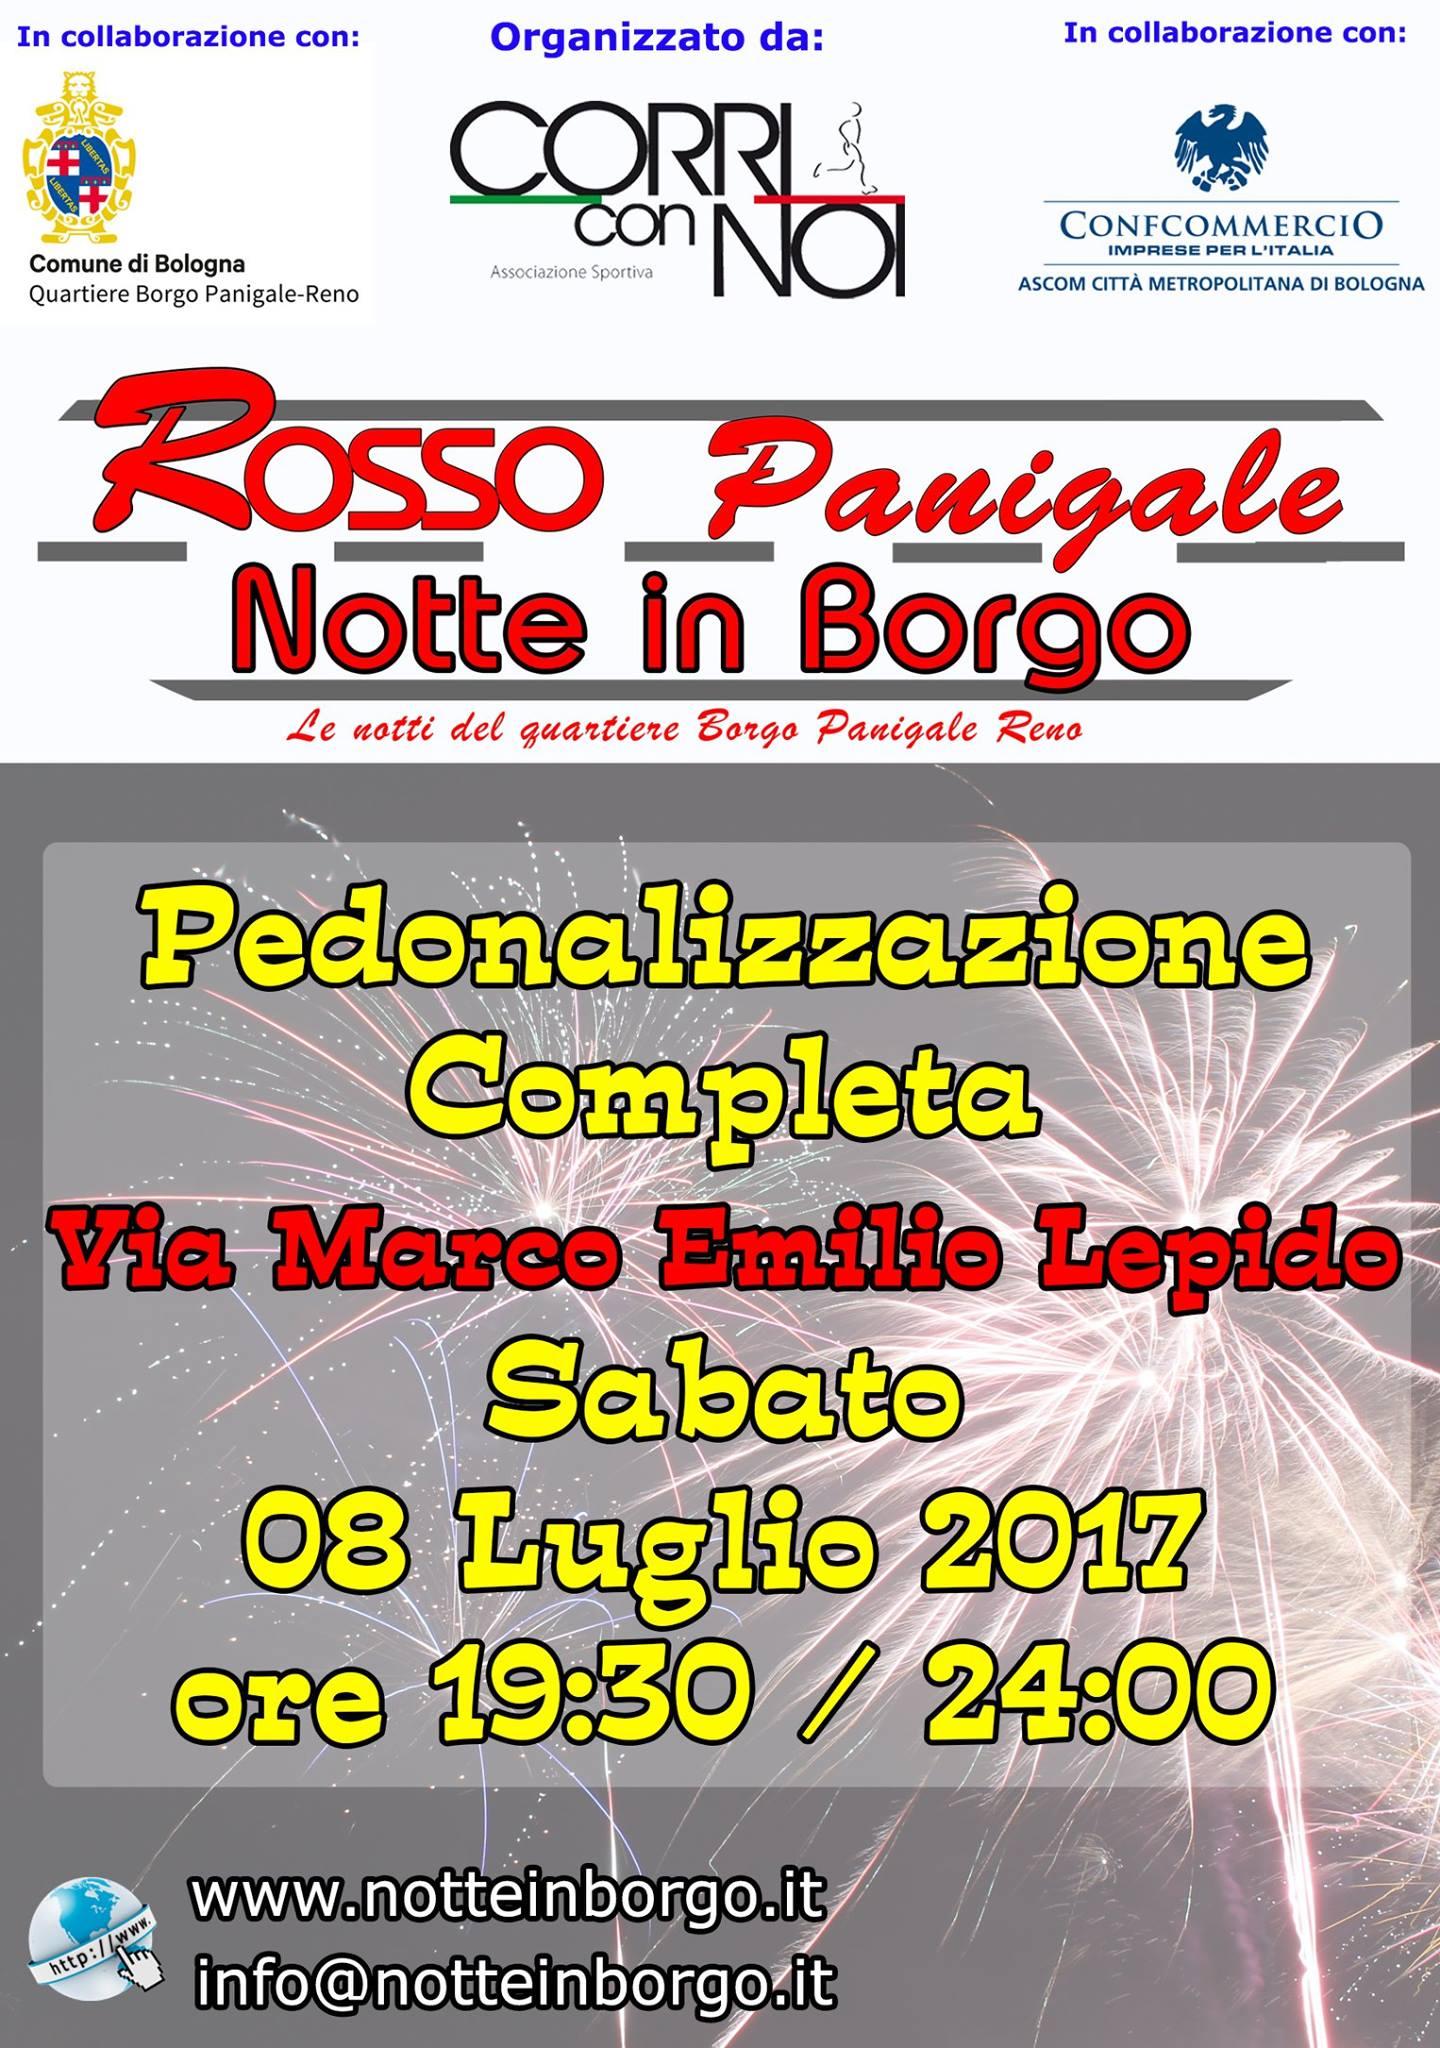 Rosso Panigale - Notte in Borgo @ Via Marco Emilio Lepido | Bologna | Emilia-Romagna | Italia